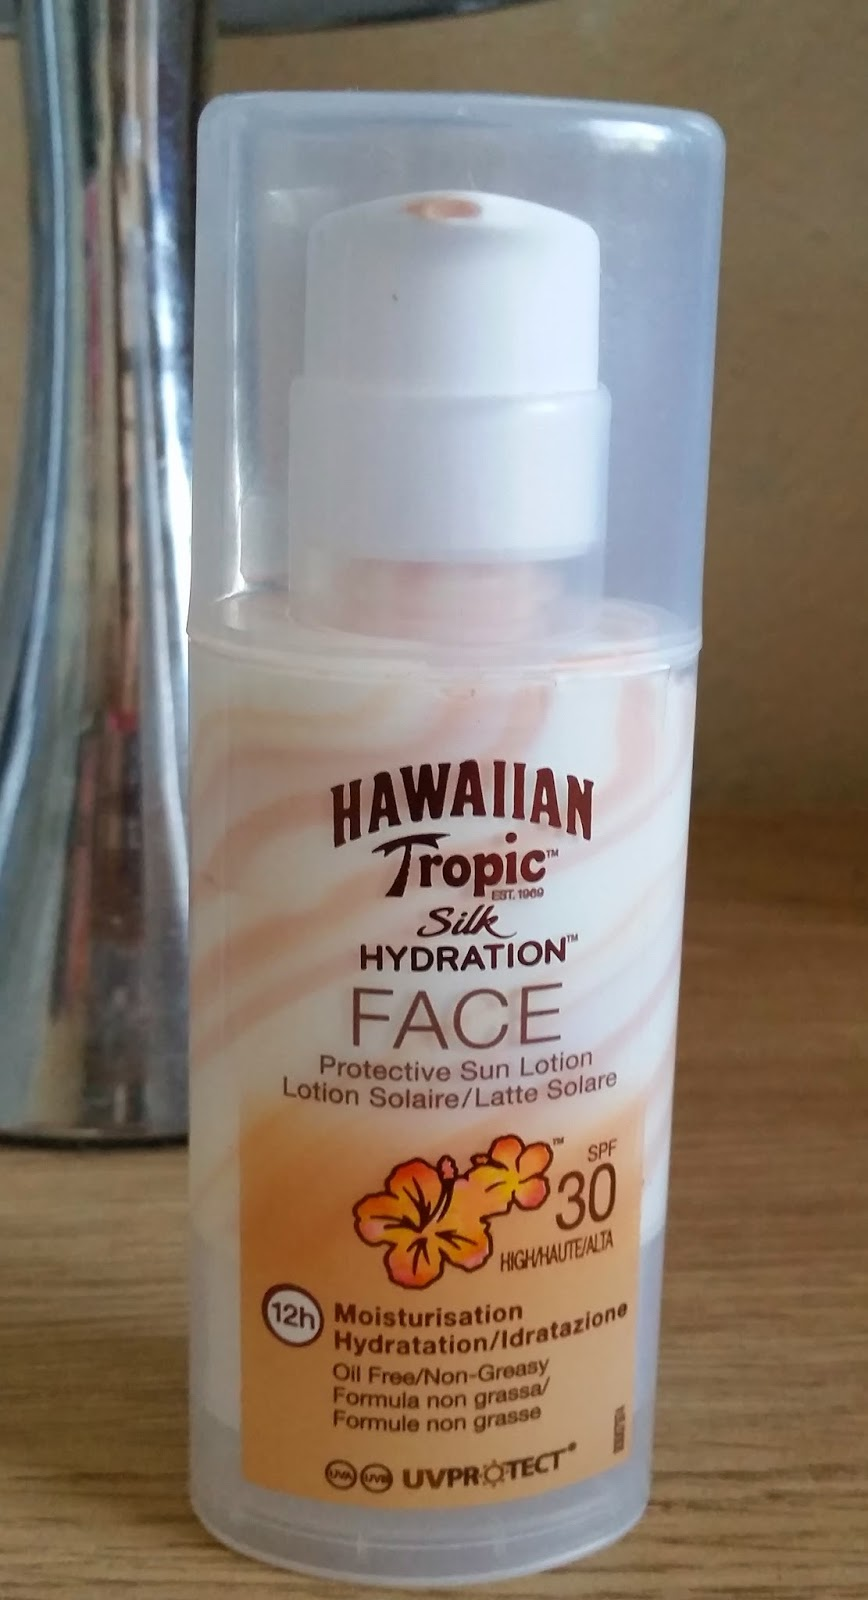 Hawaiian Tropic Silk Hydration Face SPF 30 50ml - Blonde Male 680448fe9345